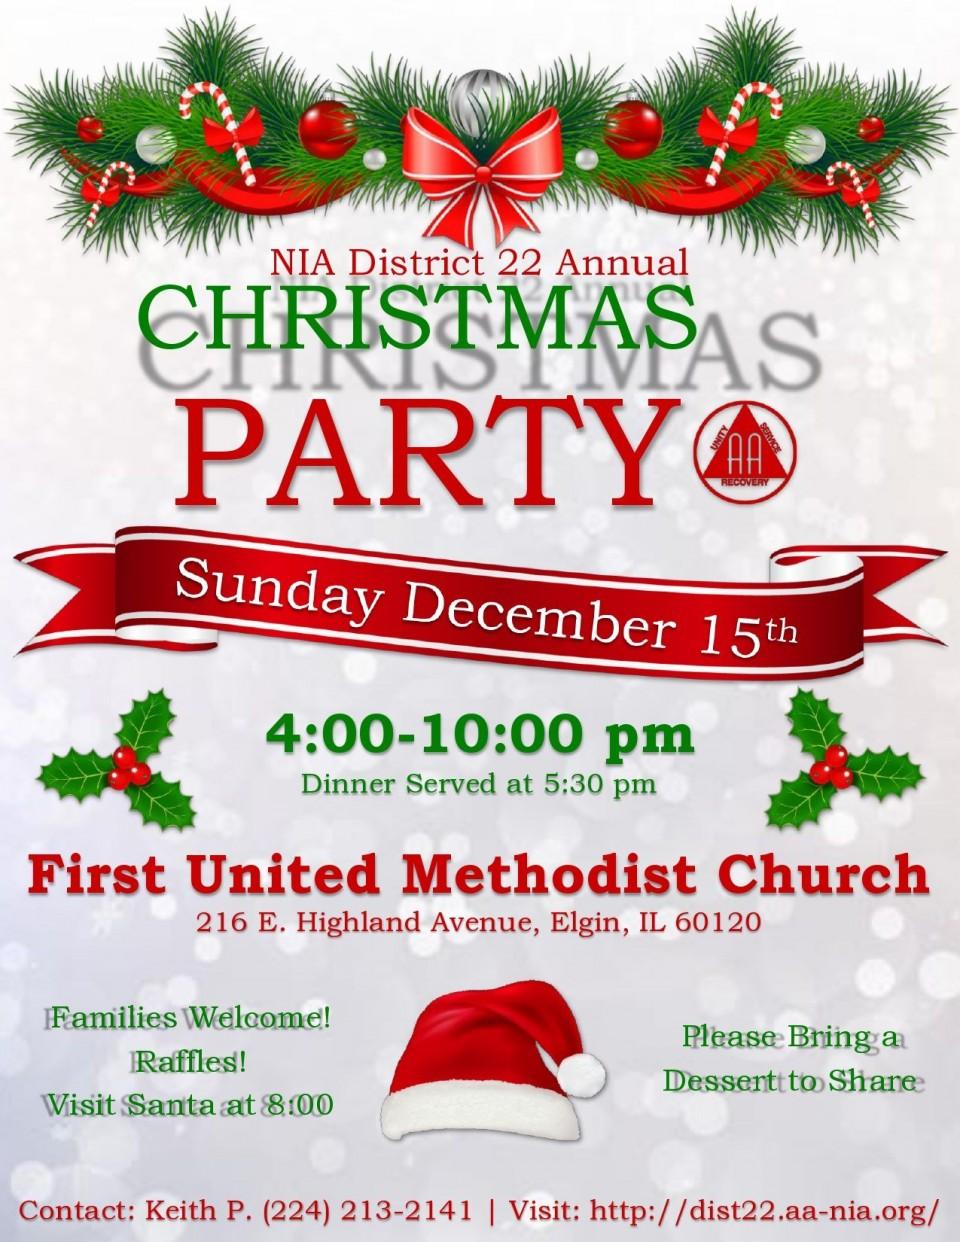 006 Phenomenal Free Church Christma Program Template Concept 960